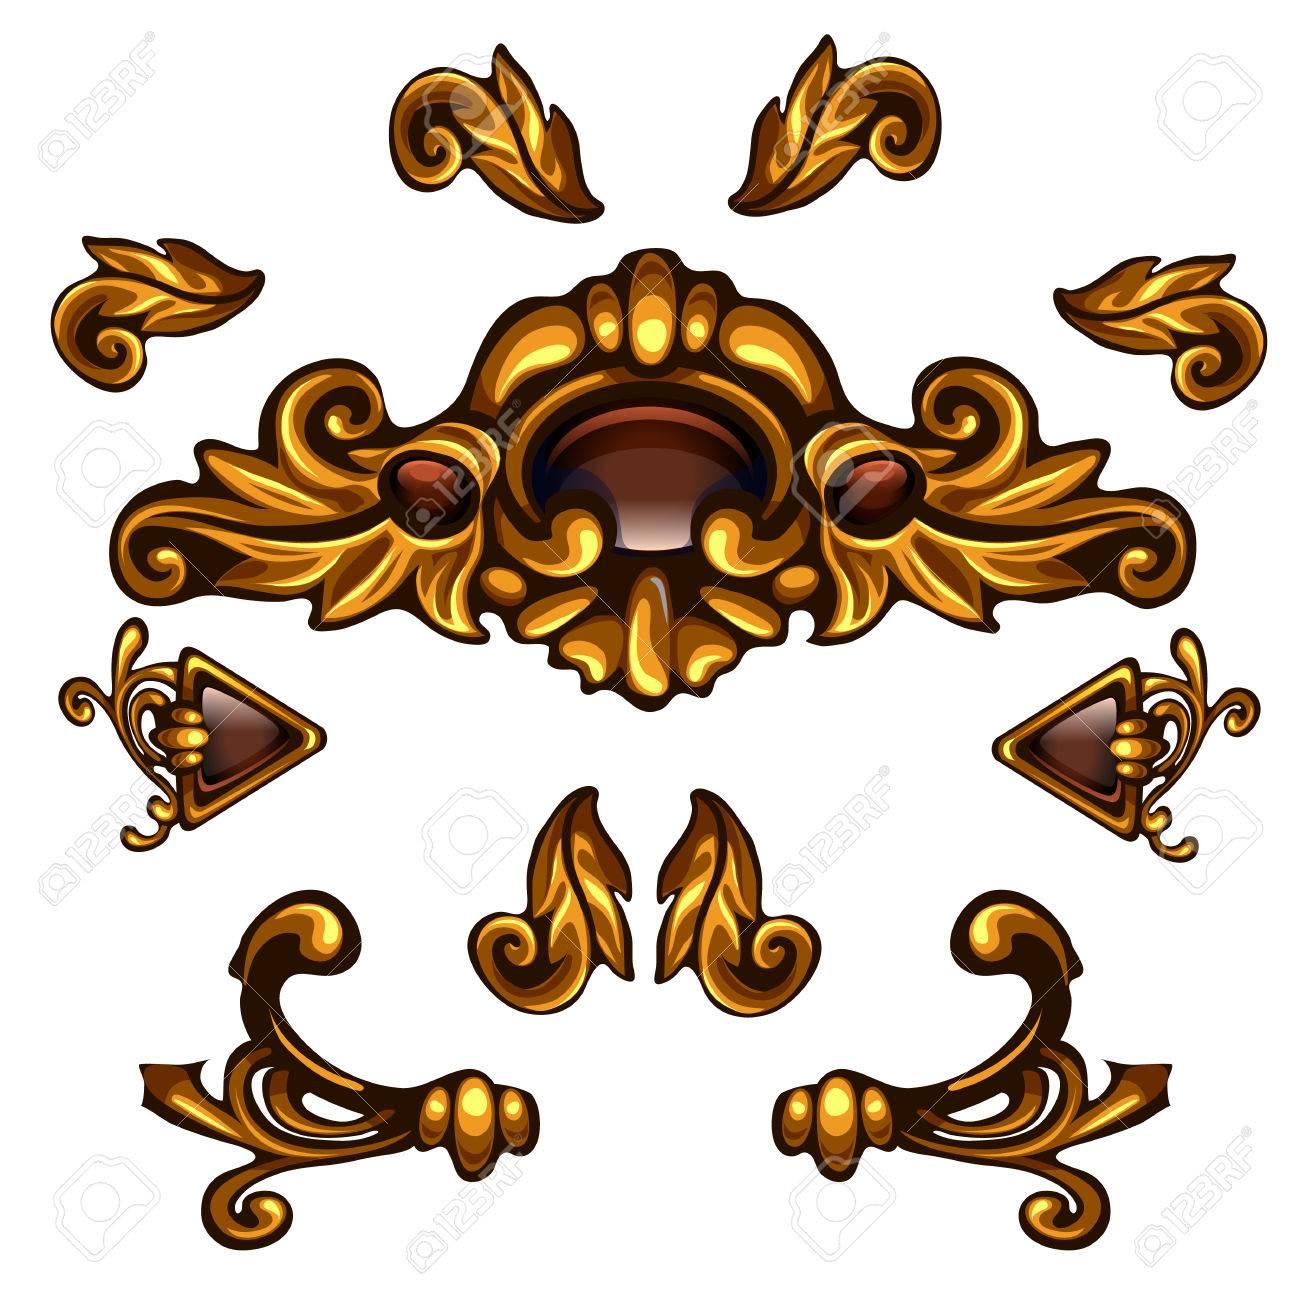 Goldene Dekorative Elemente, Blumenlocken, Pfeile, Volumenmuster ...